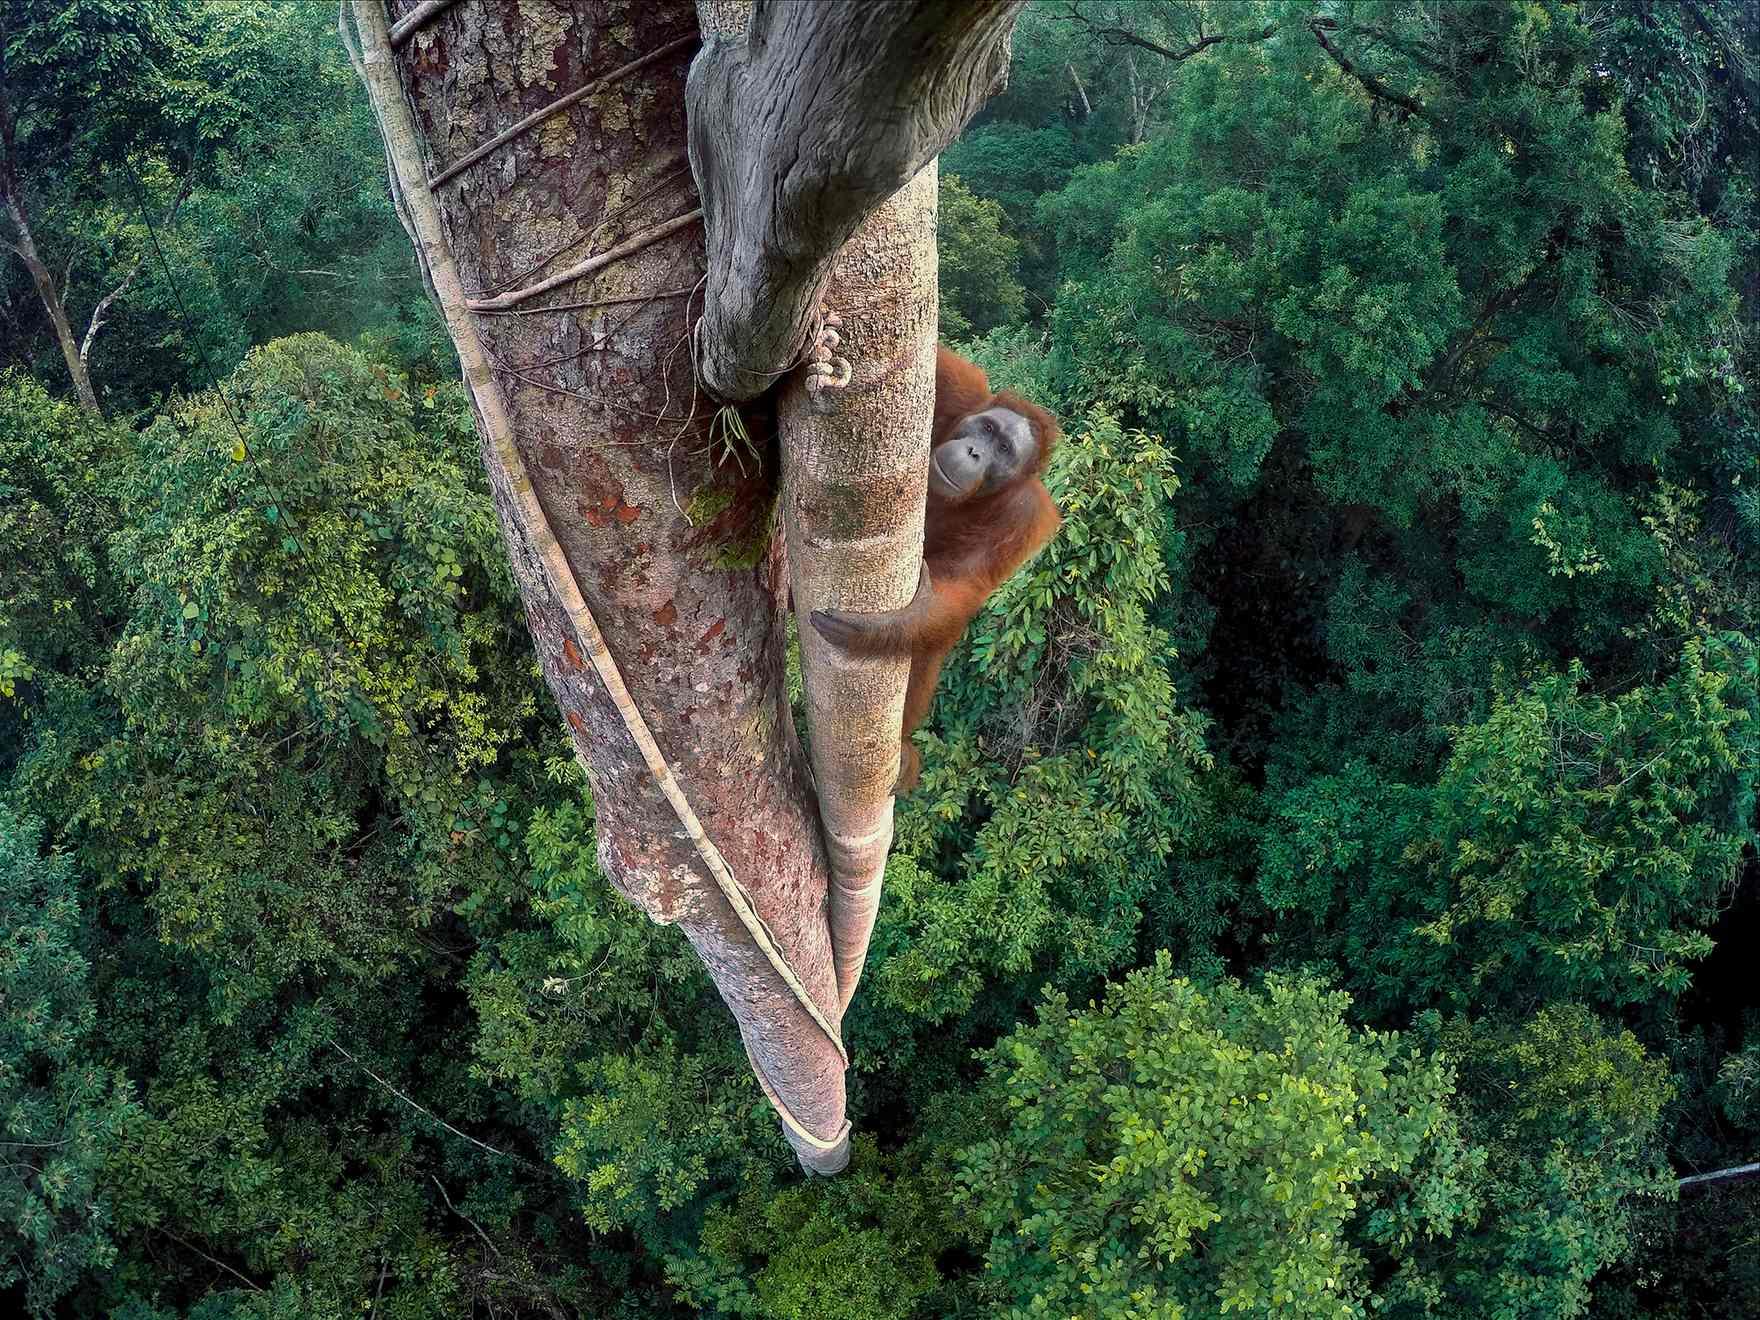 Tree borers amp bark beetles arborx tree health care - Orangutan In Borneo